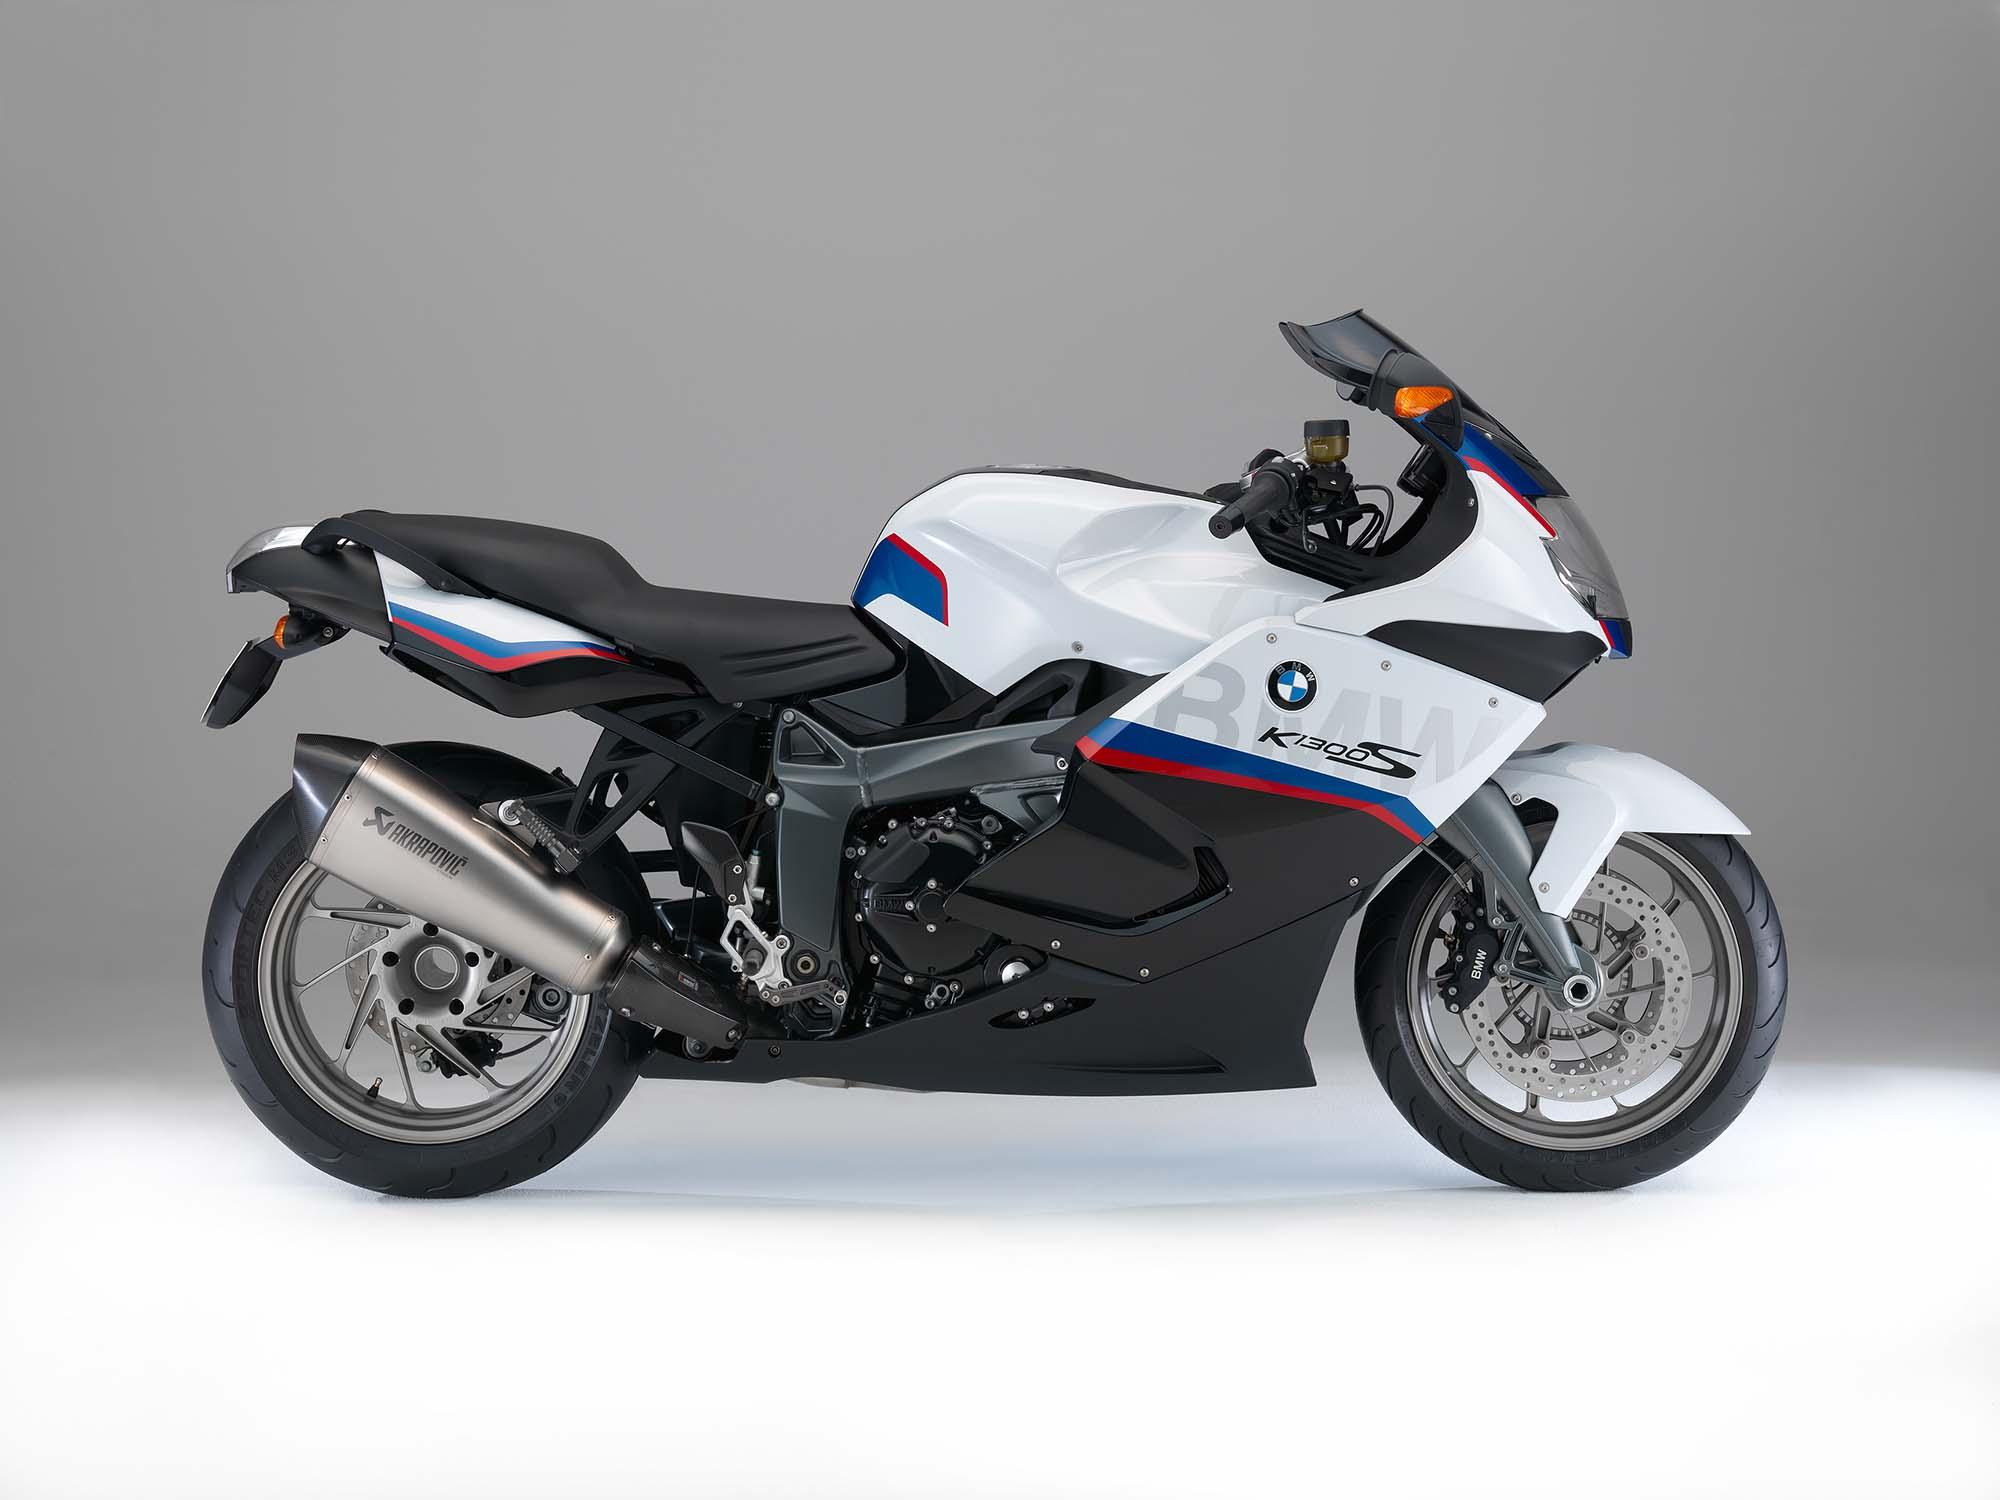 http://i1.wp.com/www.asphaltandrubber.com/wp-content/uploads/2014/07/2015-BMW-K1300S-12.jpg